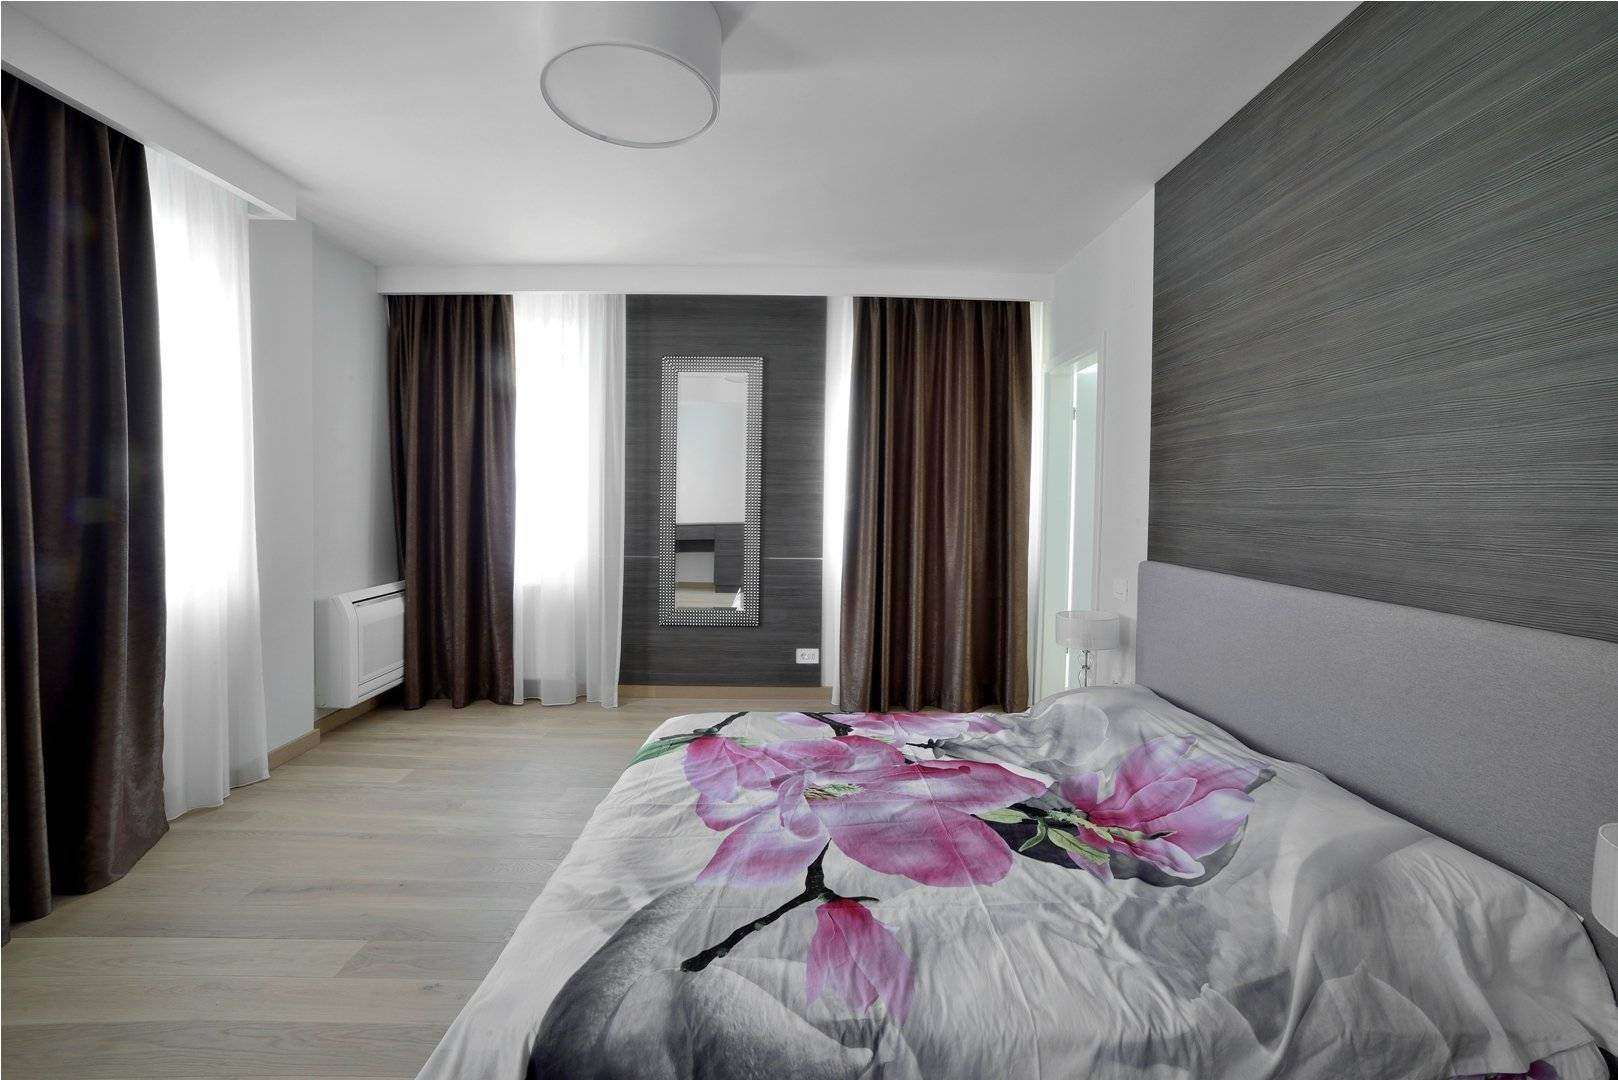 <a href=&quot;placarile de pereti decorative sunt un element de design interesant&quot;>placare perete dormitor matrimonial <img src='http://www.unican.ro/wp-content/themes/vita/img/dreapta.png' class='pull-right hidden-xs' style='margin-right:-10px;margin-top:-10px; max-height:41px'></a>